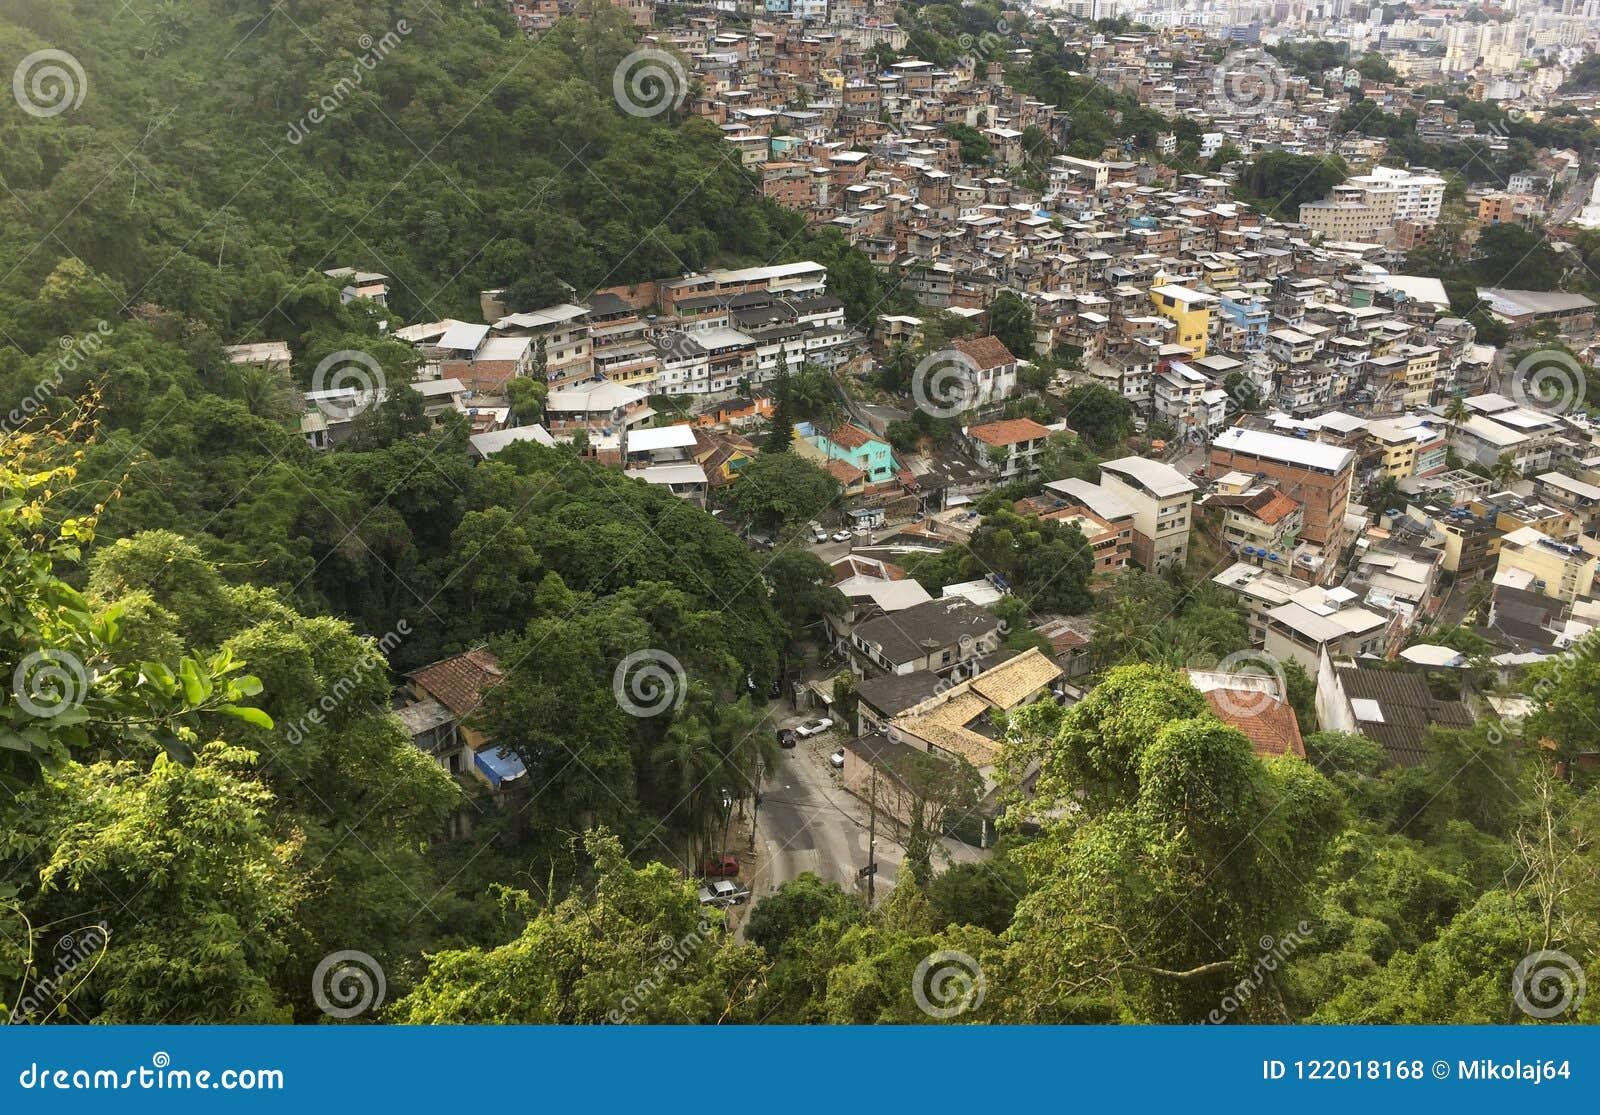 Favela Morro DOS Prazeres in Rio de Janeiro